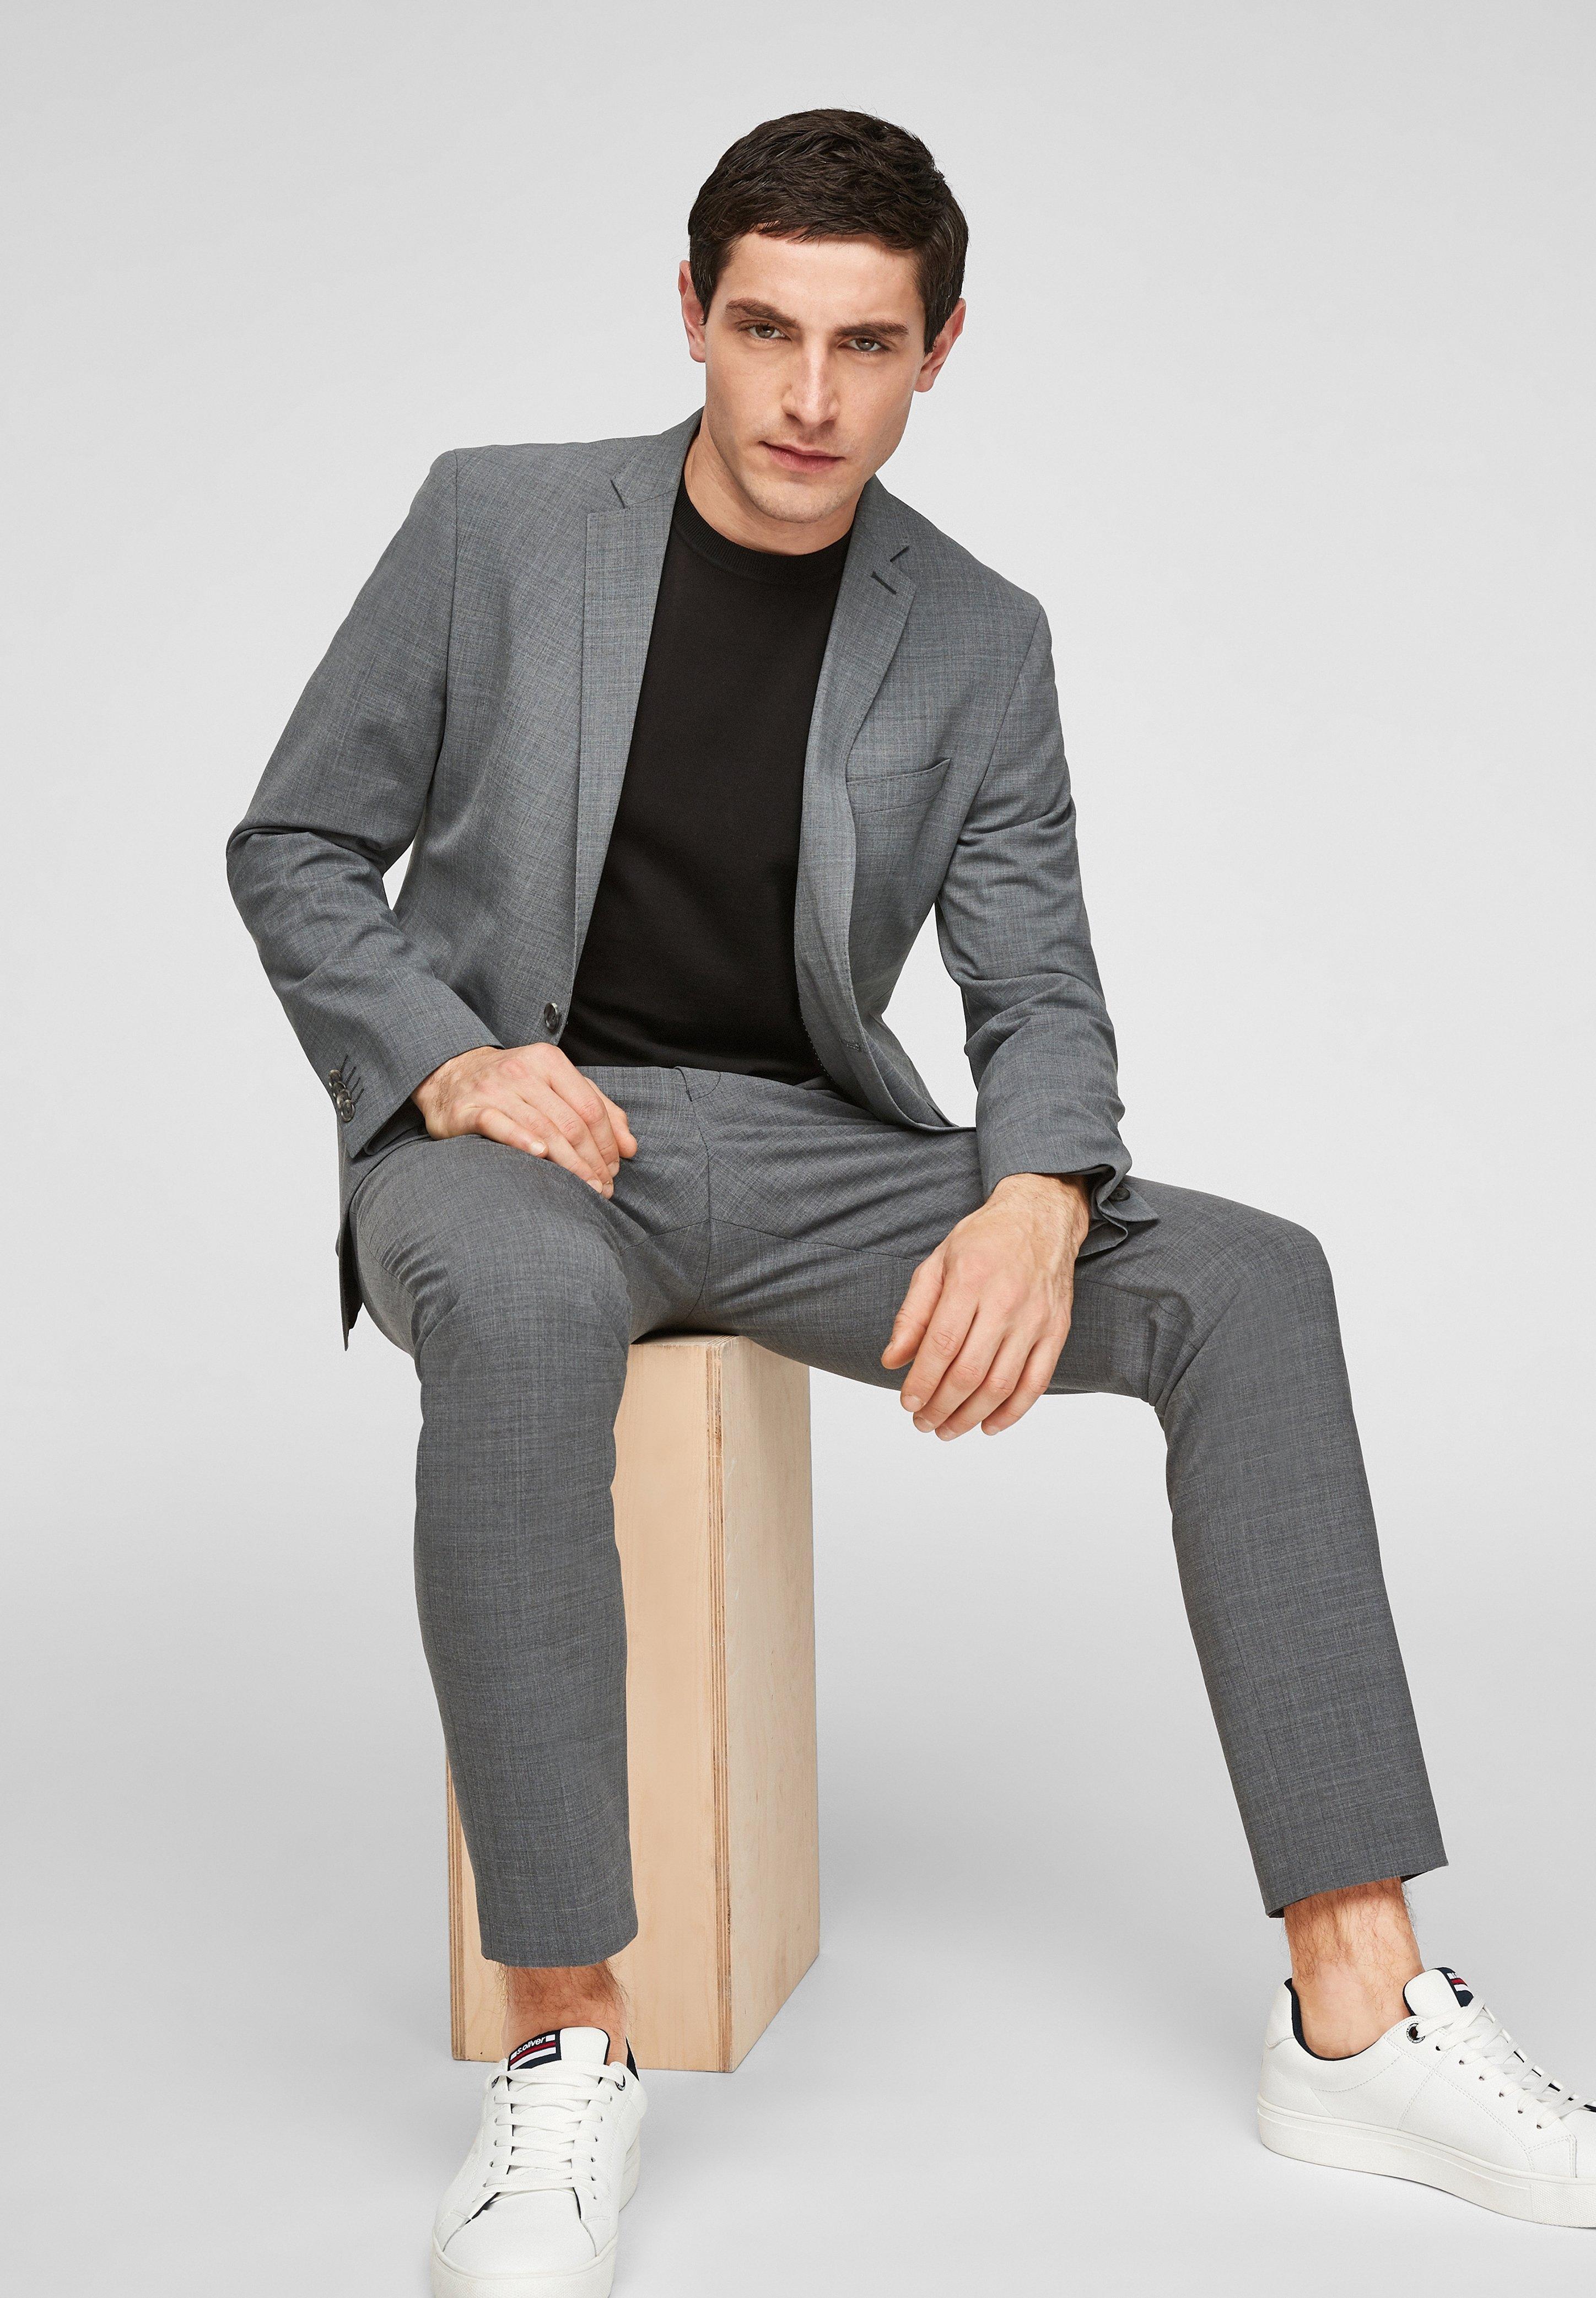 Homme SLIM : VESTON HYPER-STRETCH - Veste de costume